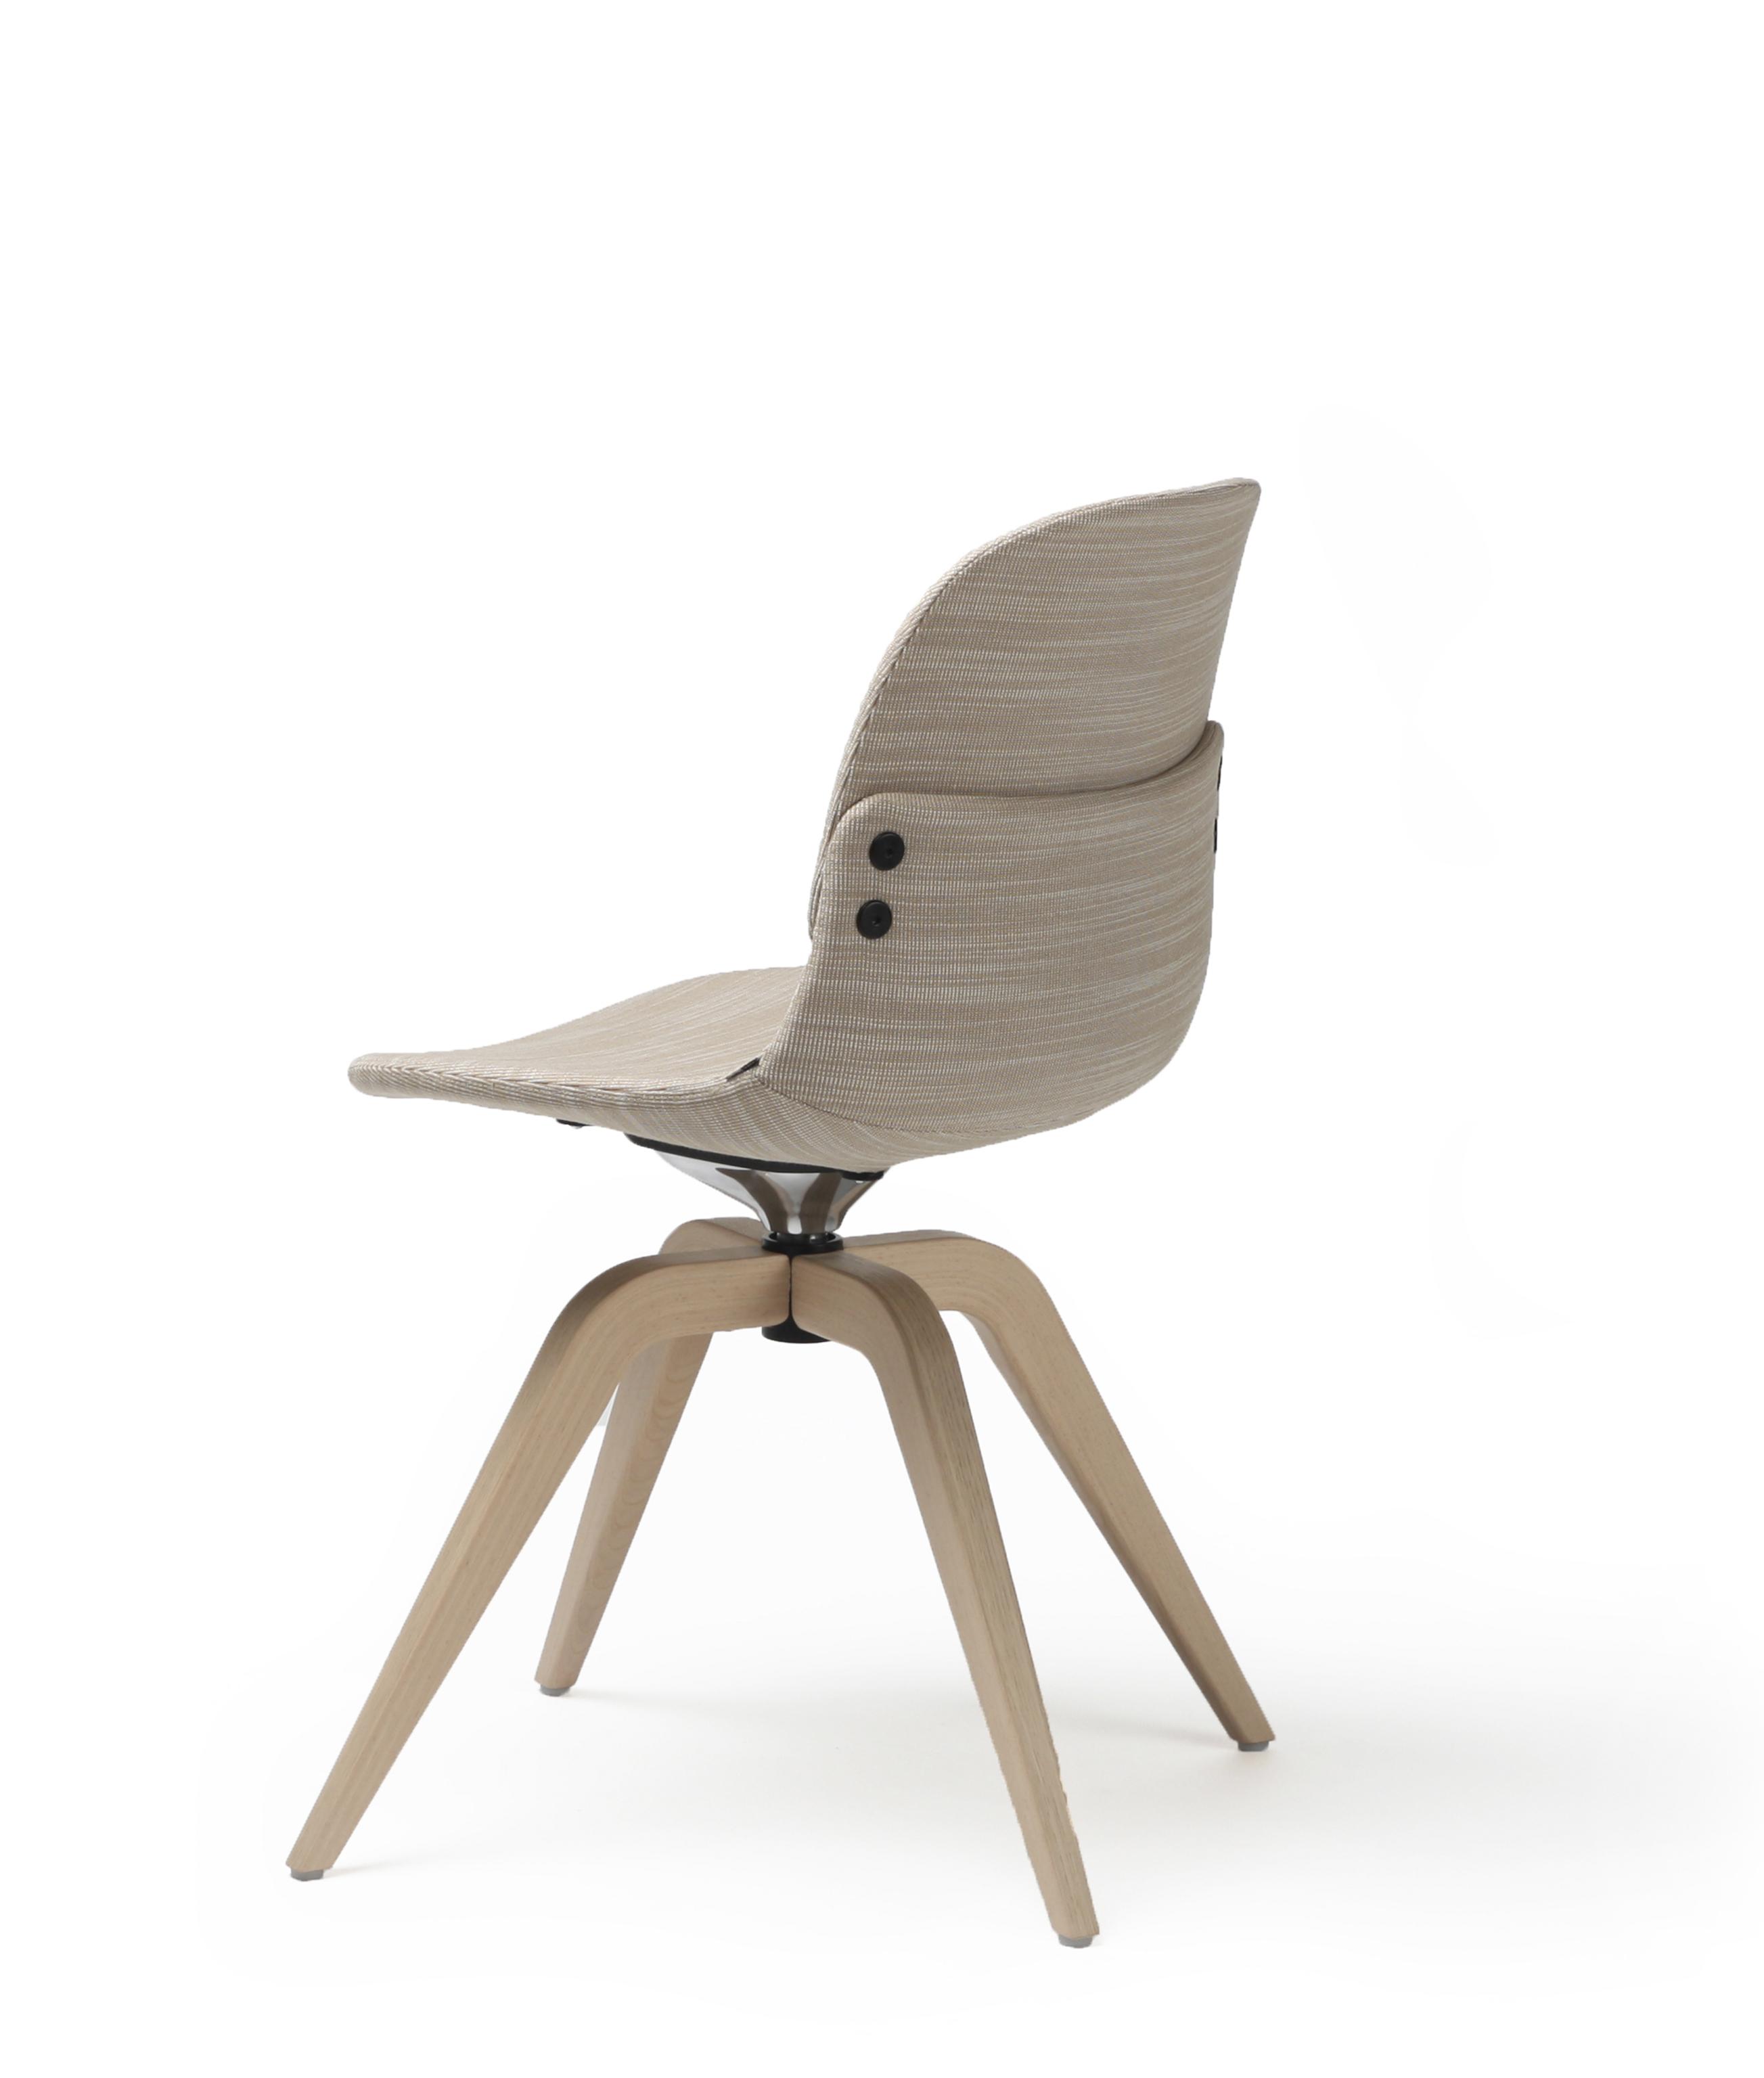 Con III overstoppet stol med lav rygg og understell i eik Fora Form kopi